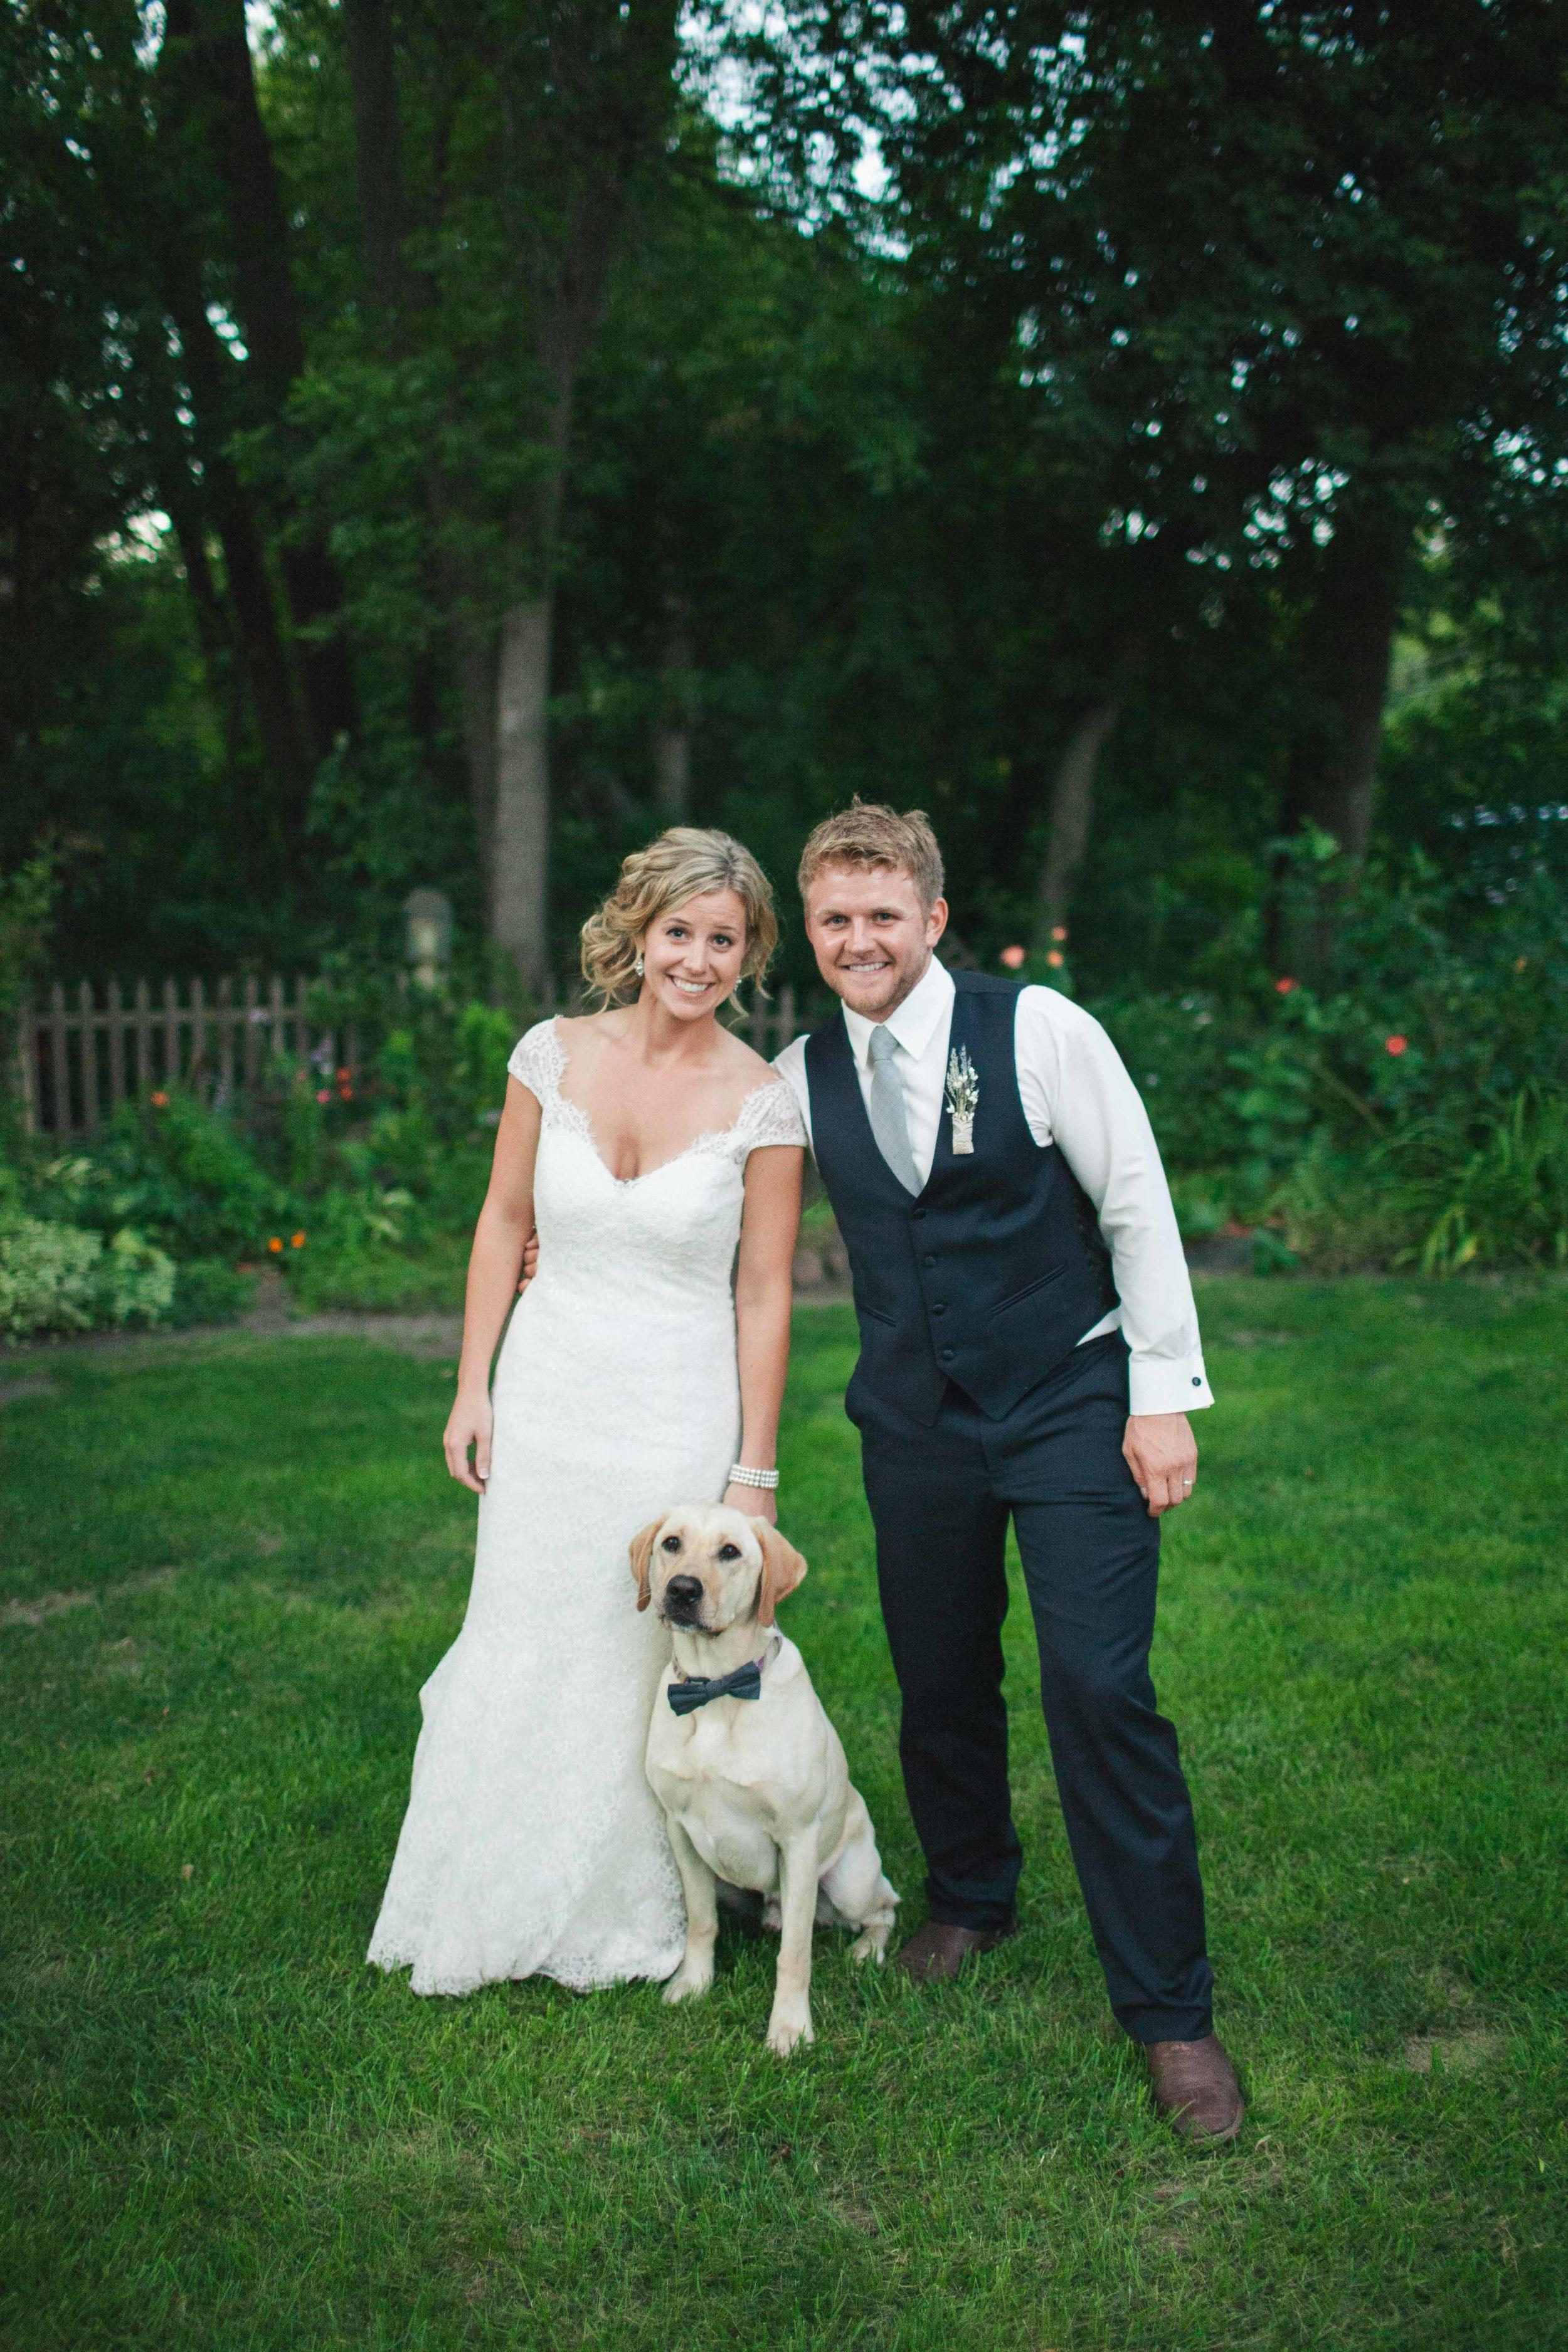 Minnesota Backyard Wedding Minneapolis Jess Dan (112 of 131).jpg